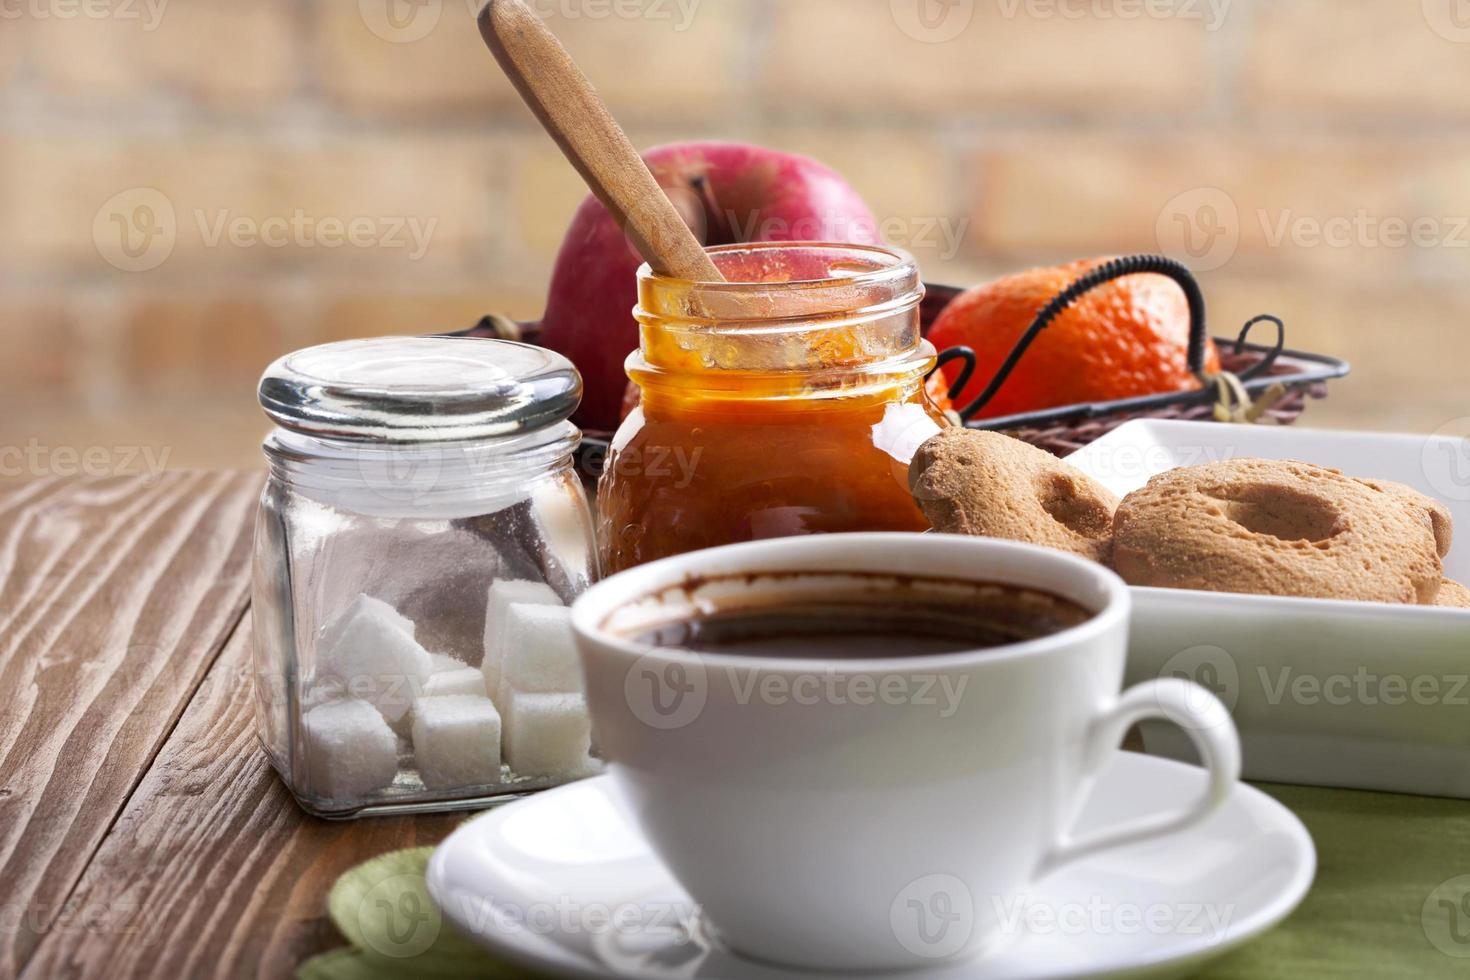 Coffee and snacks photo